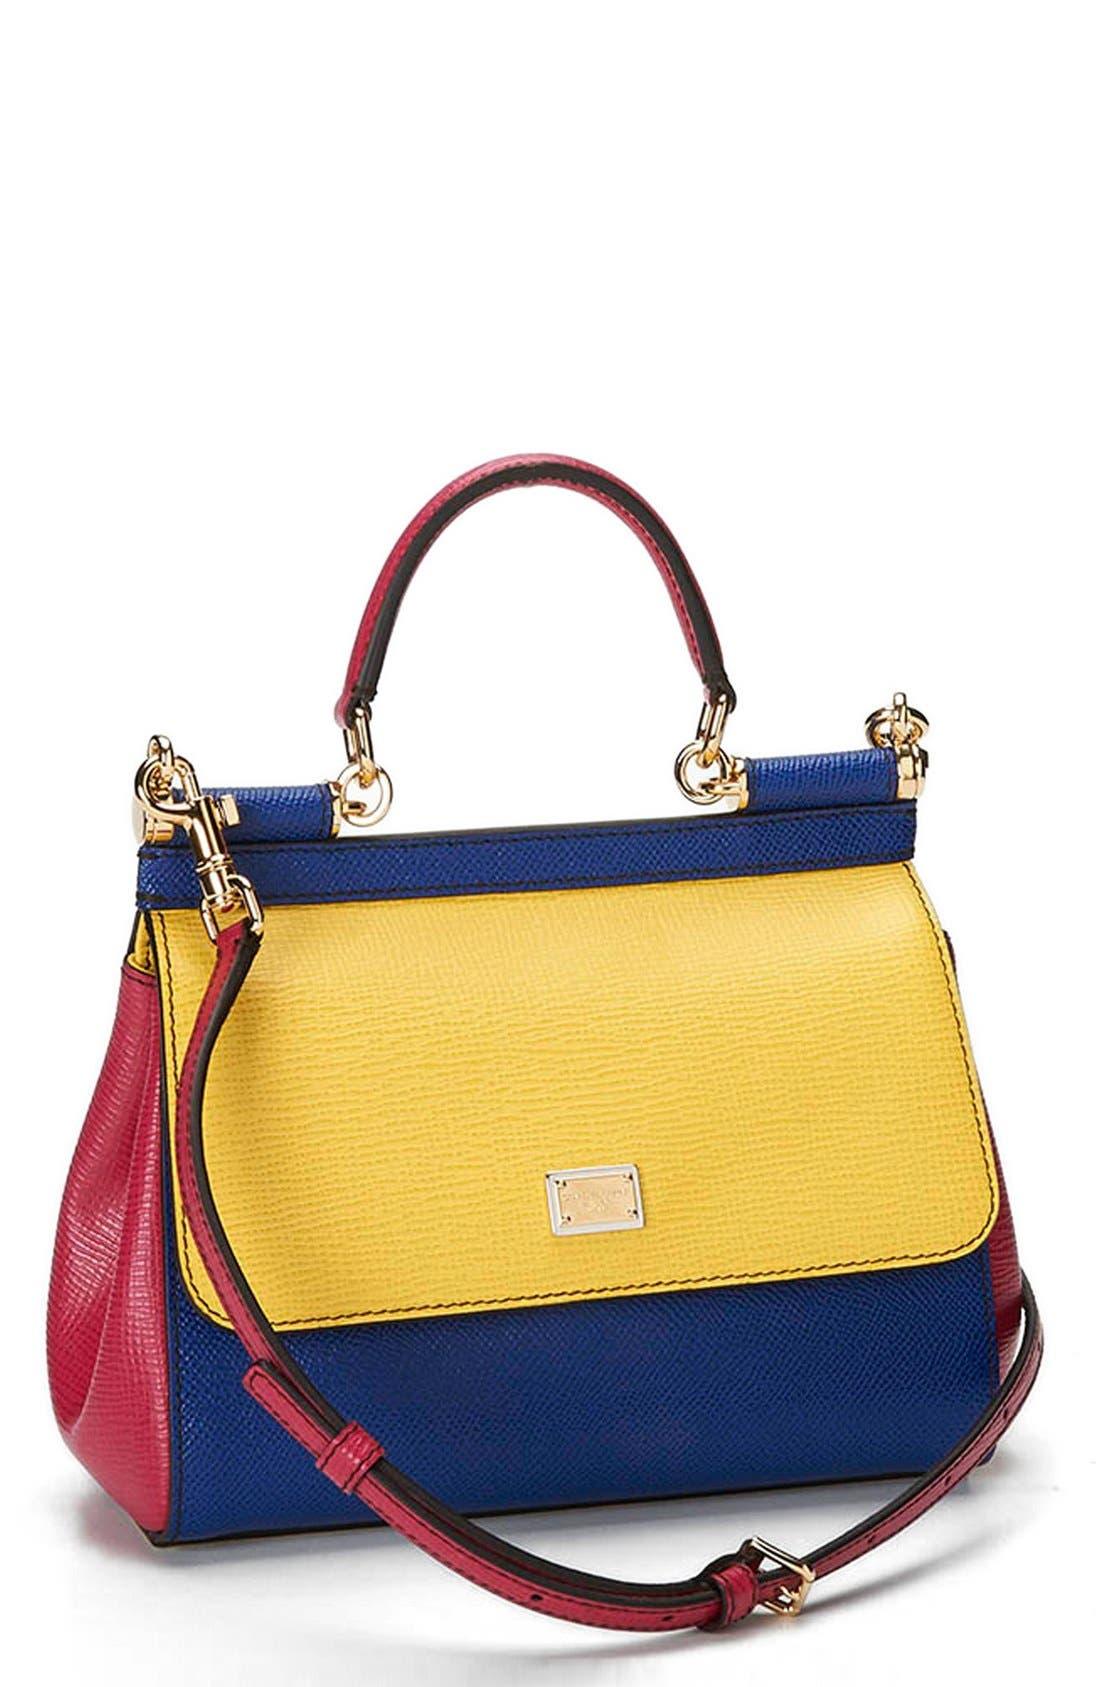 Main Image - Dolce&Gabbana 'Mini Miss Sicily' Colorblock Leather Satchel